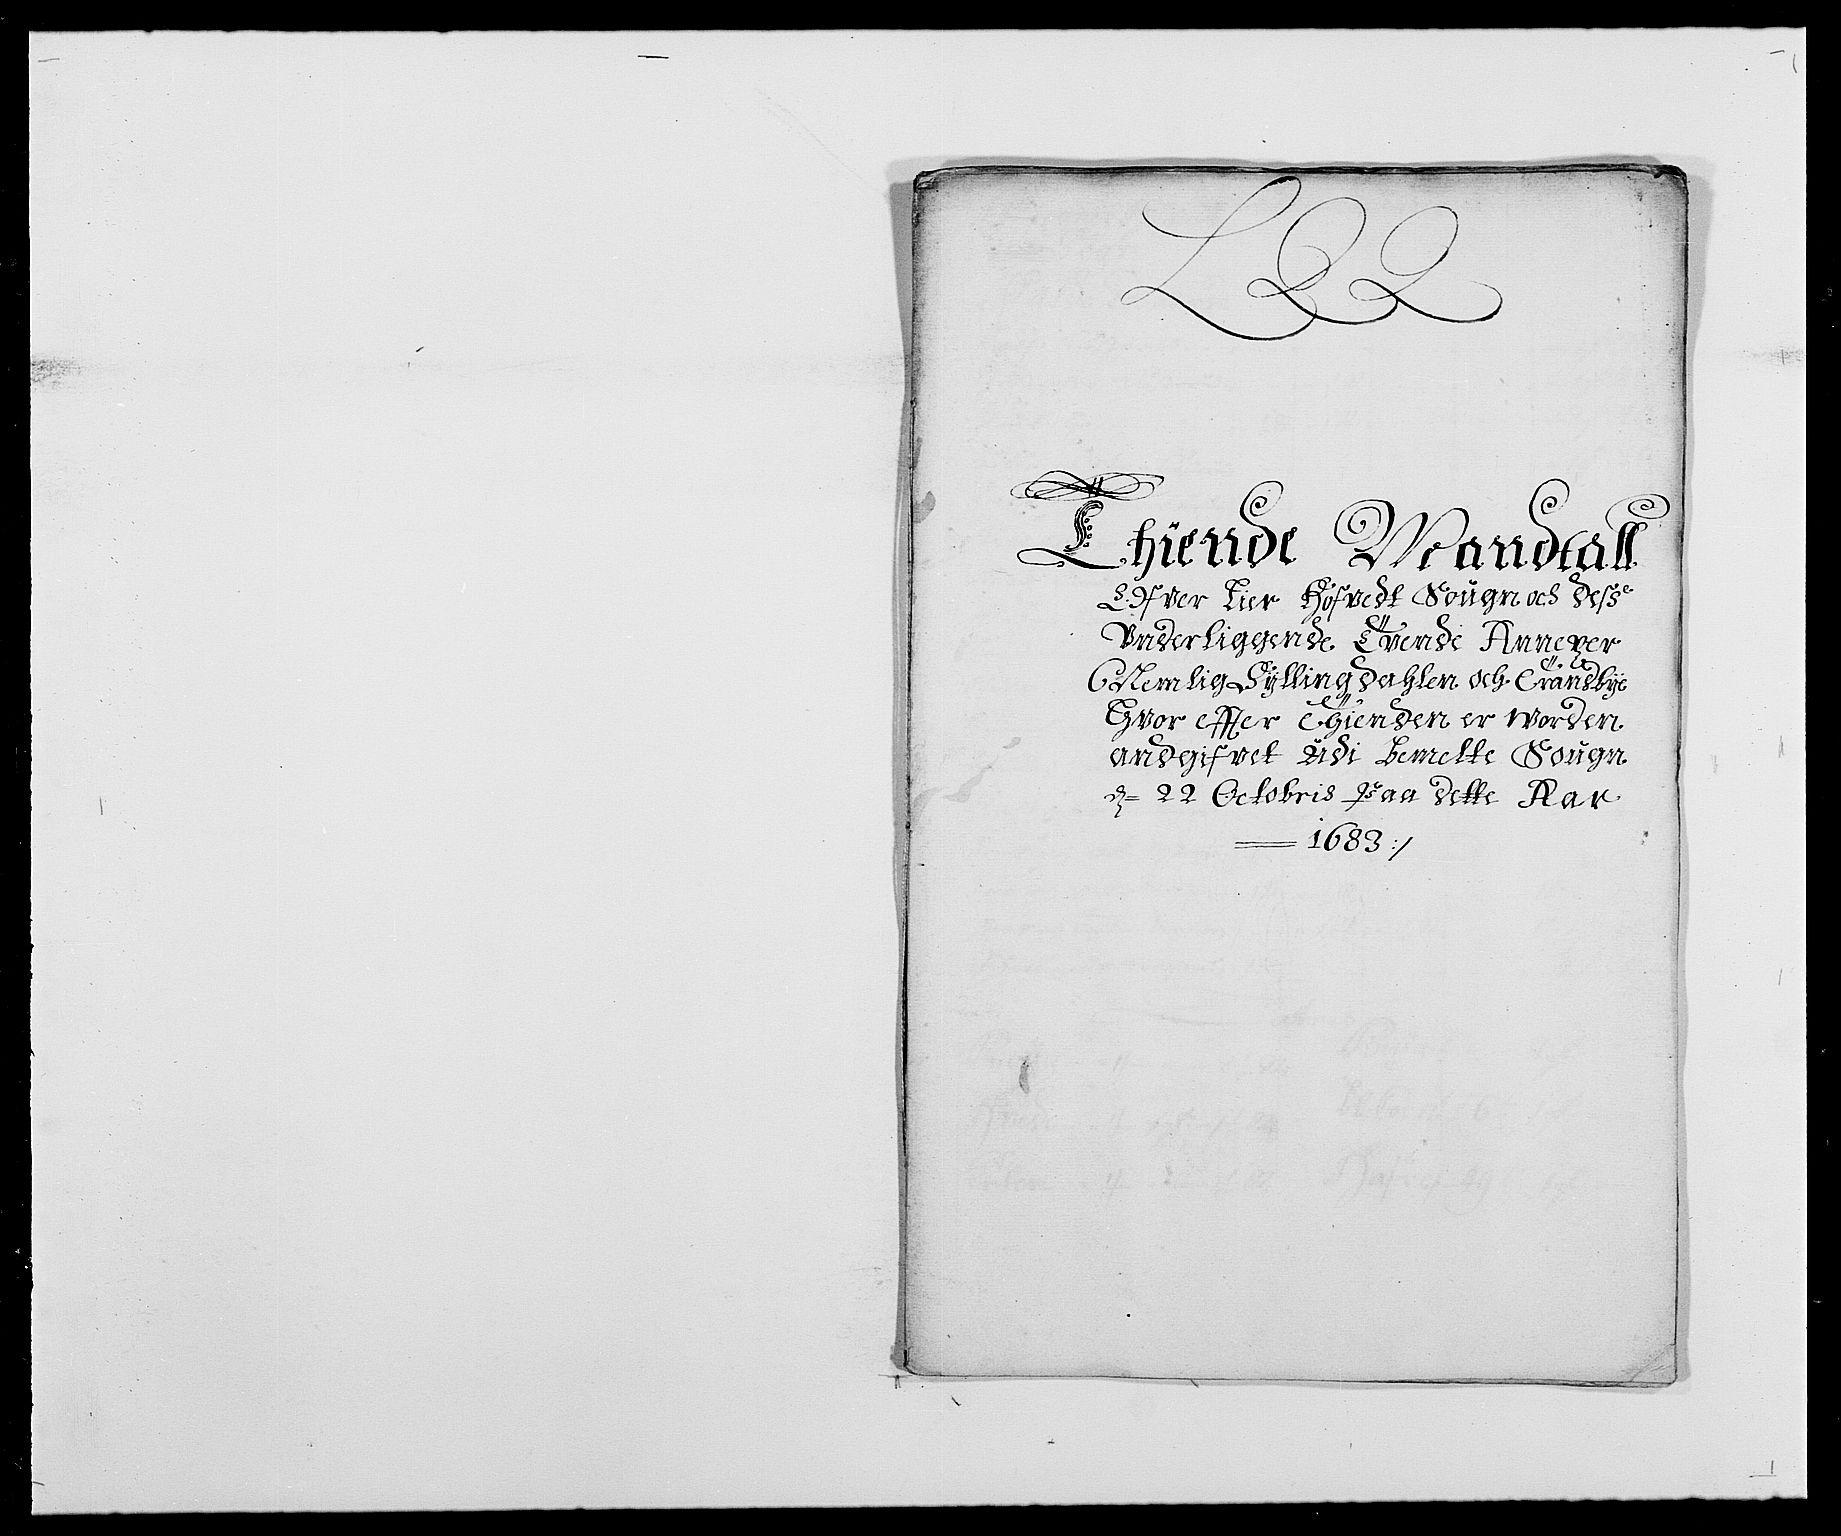 RA, Rentekammeret inntil 1814, Reviderte regnskaper, Fogderegnskap, R27/L1687: Fogderegnskap Lier, 1678-1686, s. 5